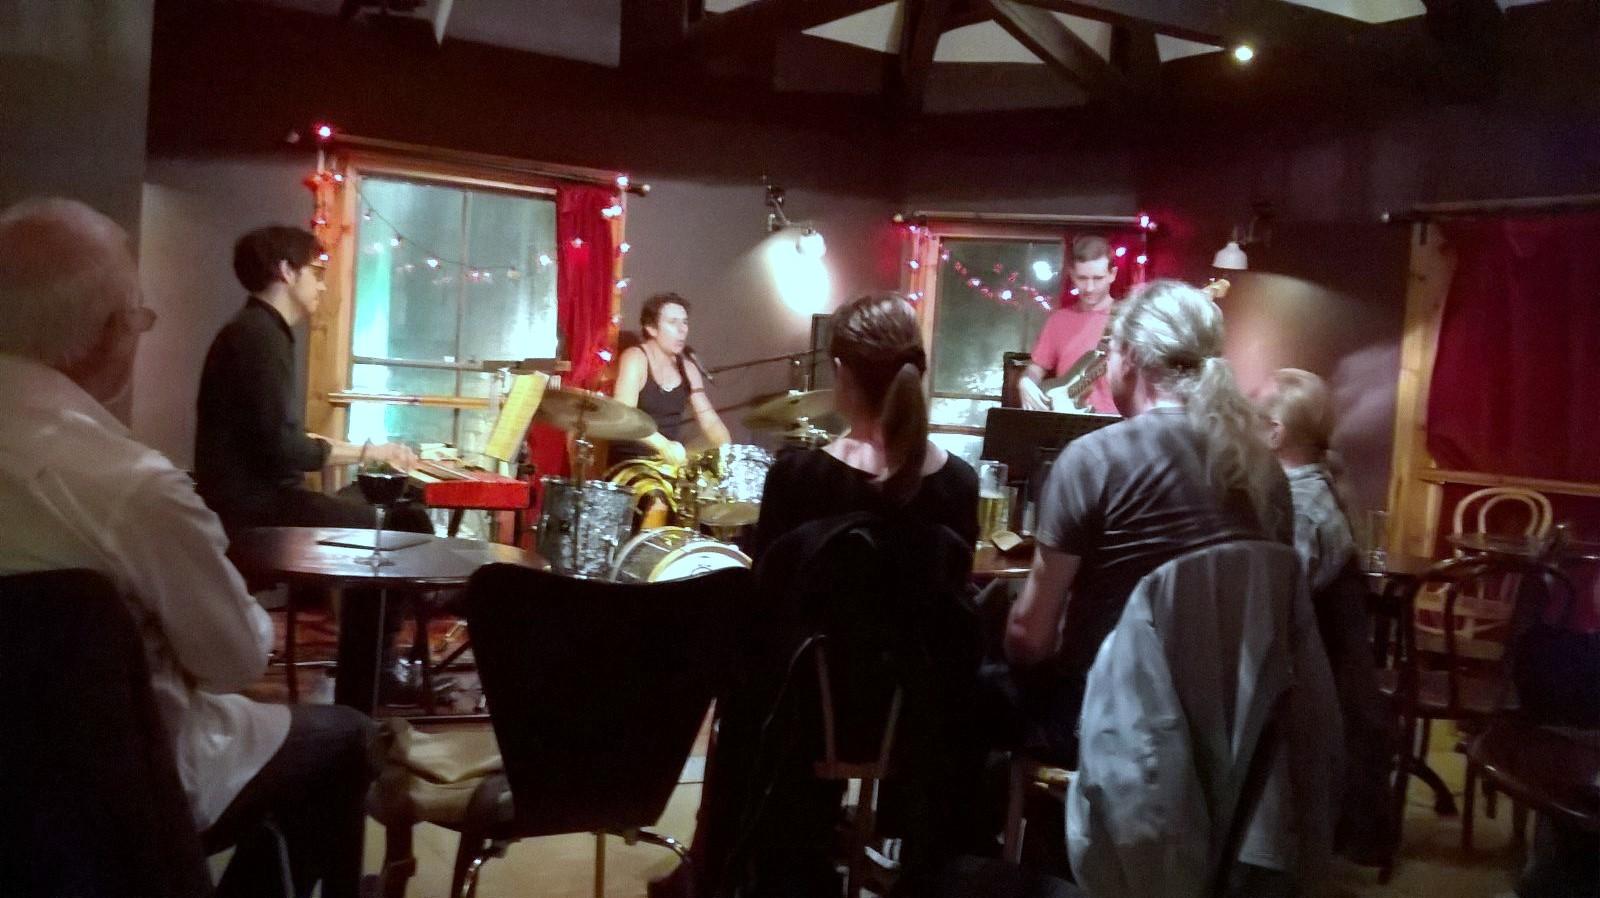 bebop spoken here: Sean Noonan's Memorable Sticks @ The Jazz Cafe